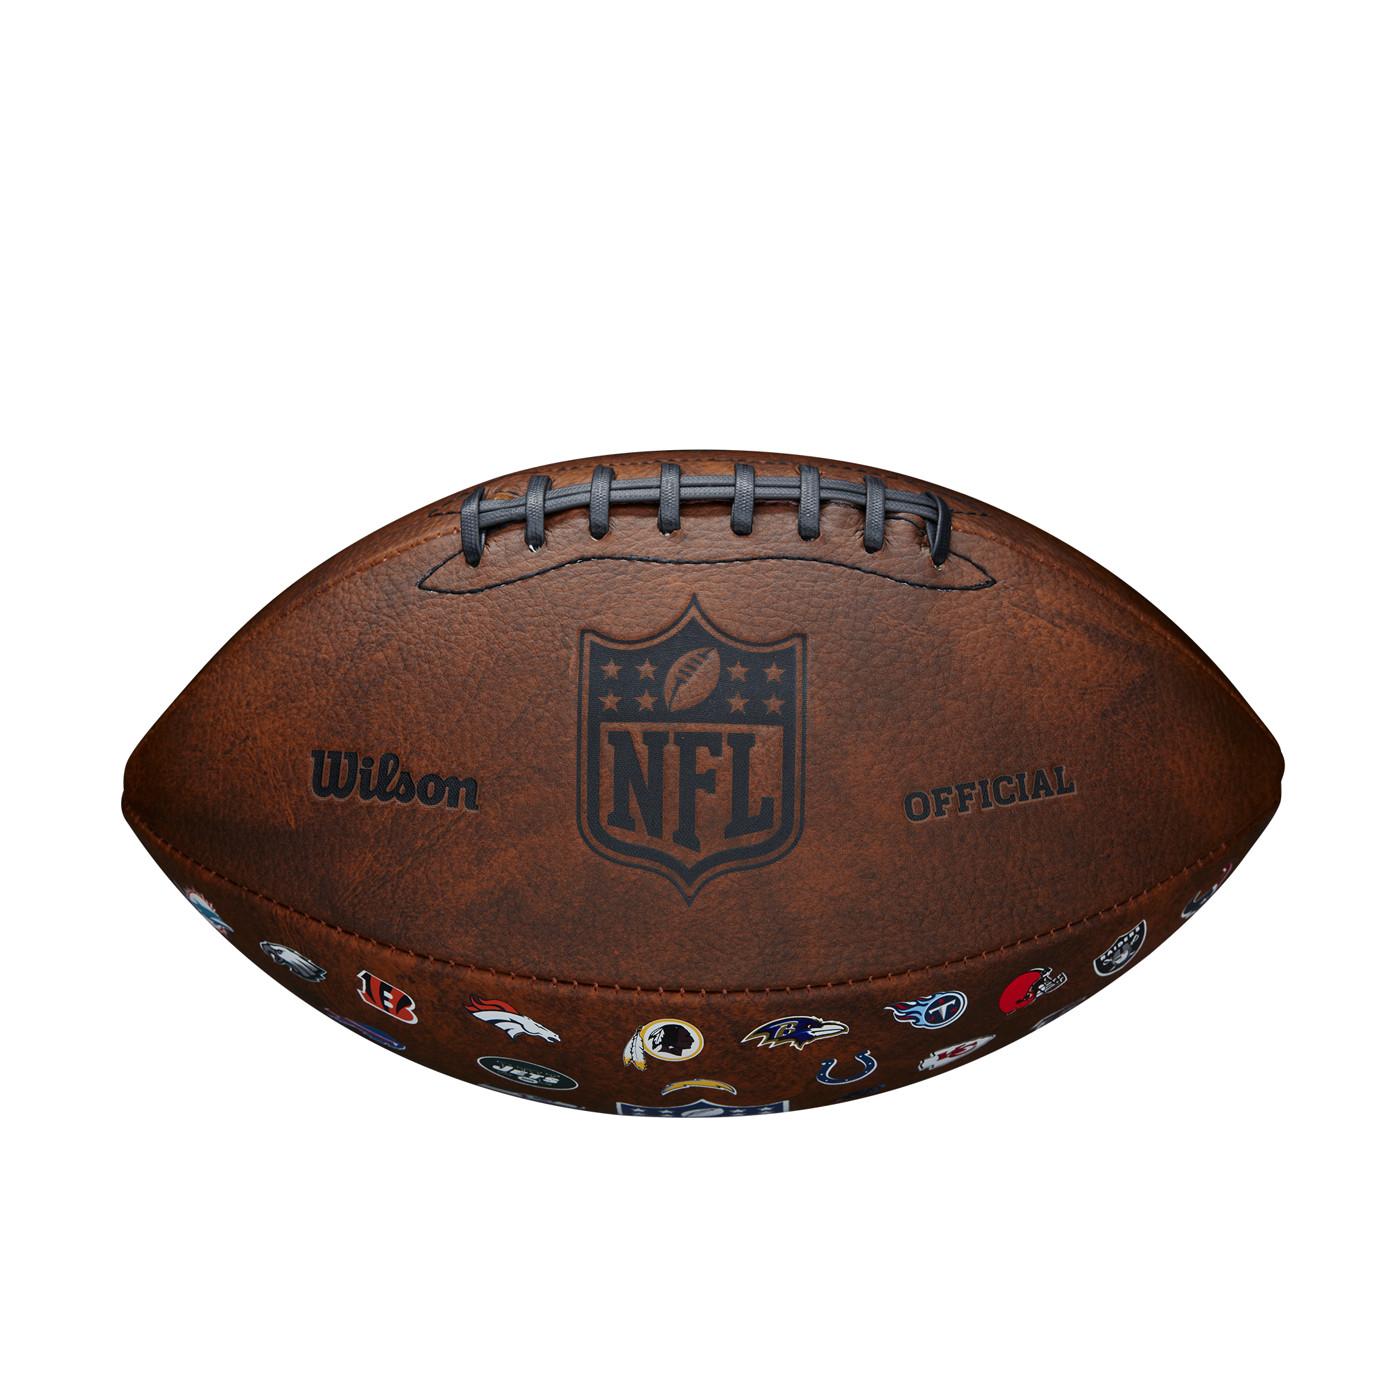 WILSON NFL OFF THROWBACK 32 TEAM LOGO